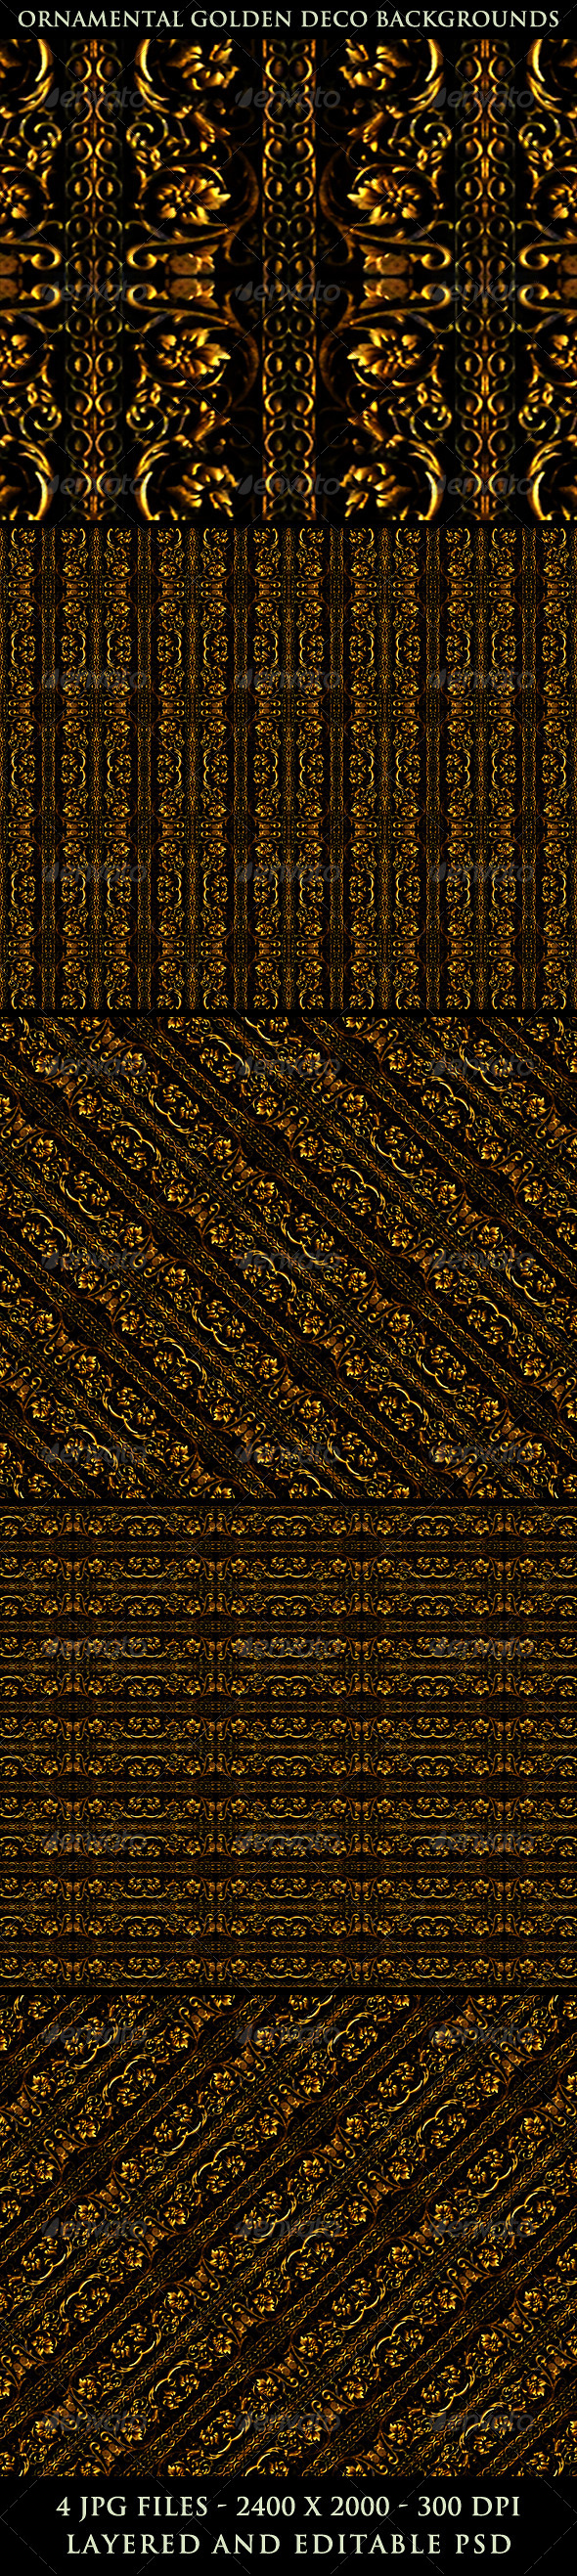 Ornamental Golden Deco Backgrounds - Patterns Backgrounds